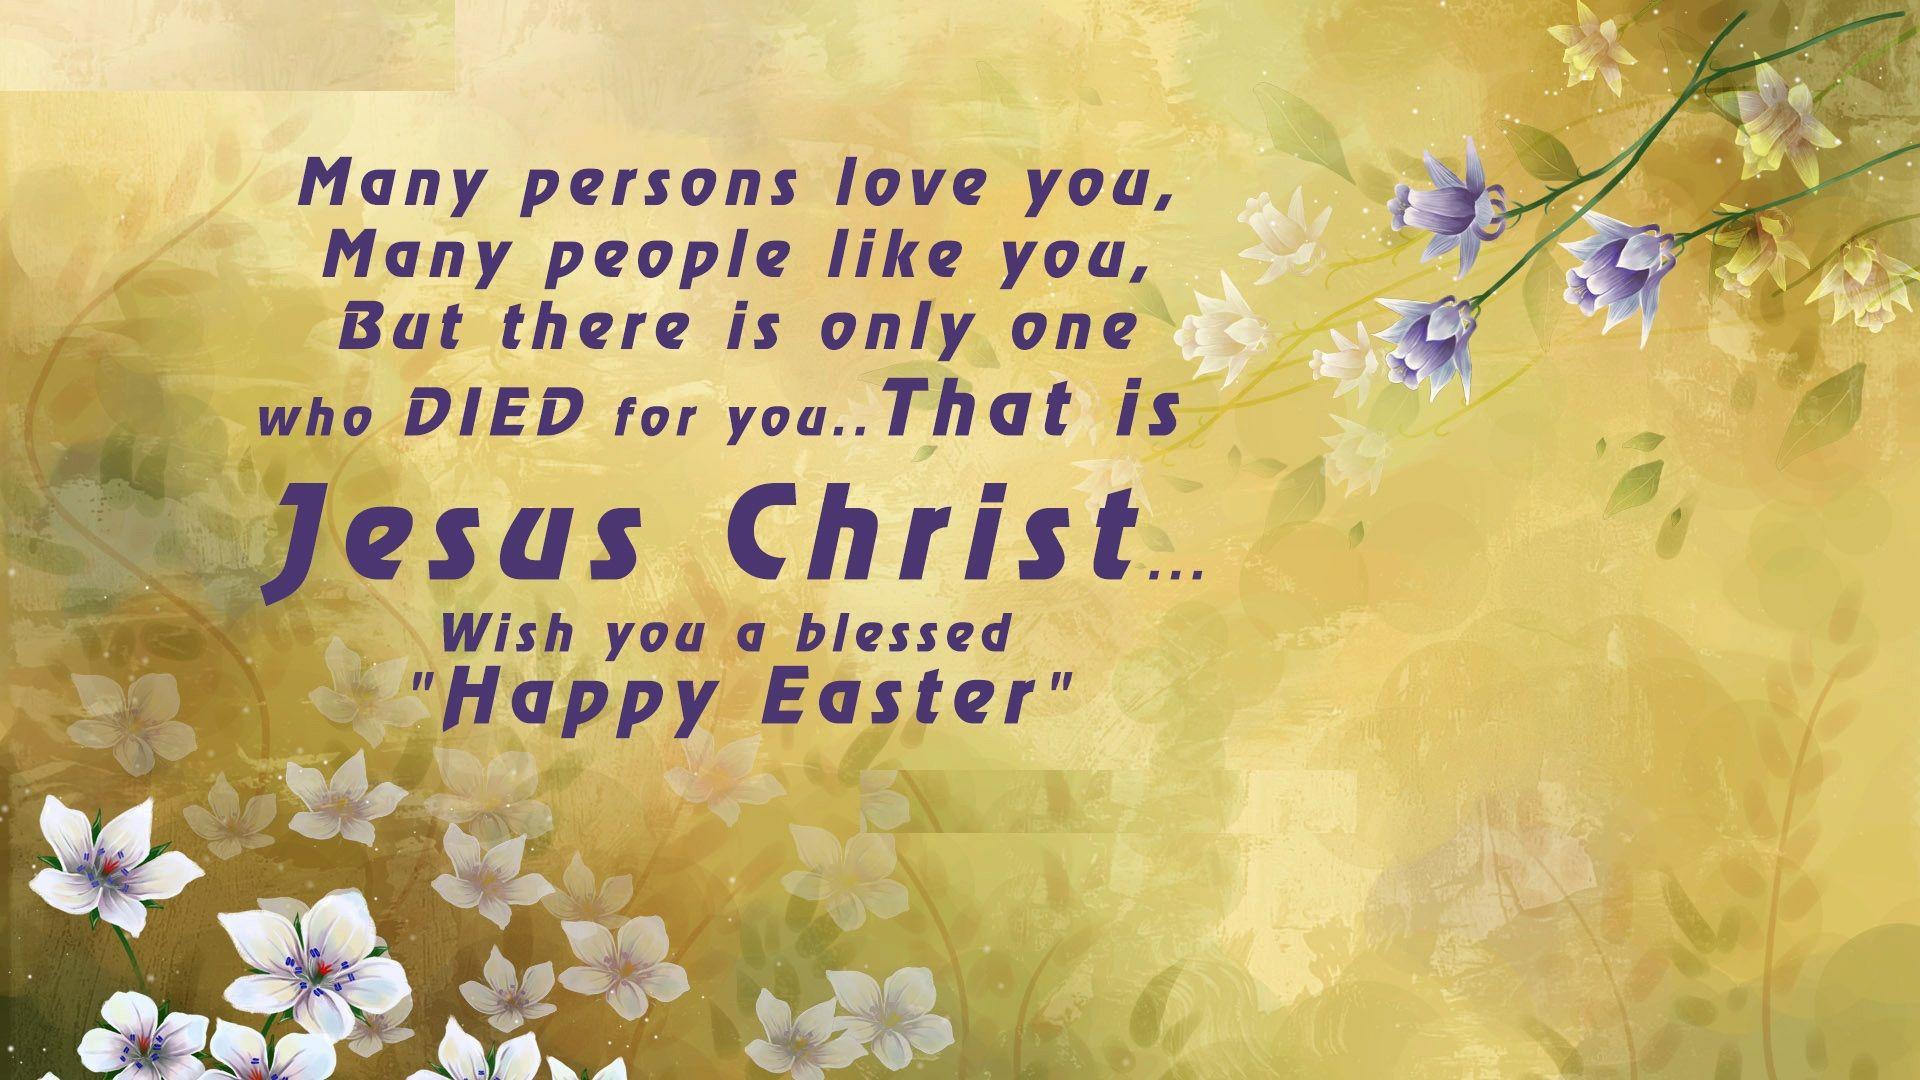 Easter Sunday Jesus Christ Quotes 2018 Easter Pinterest Easter